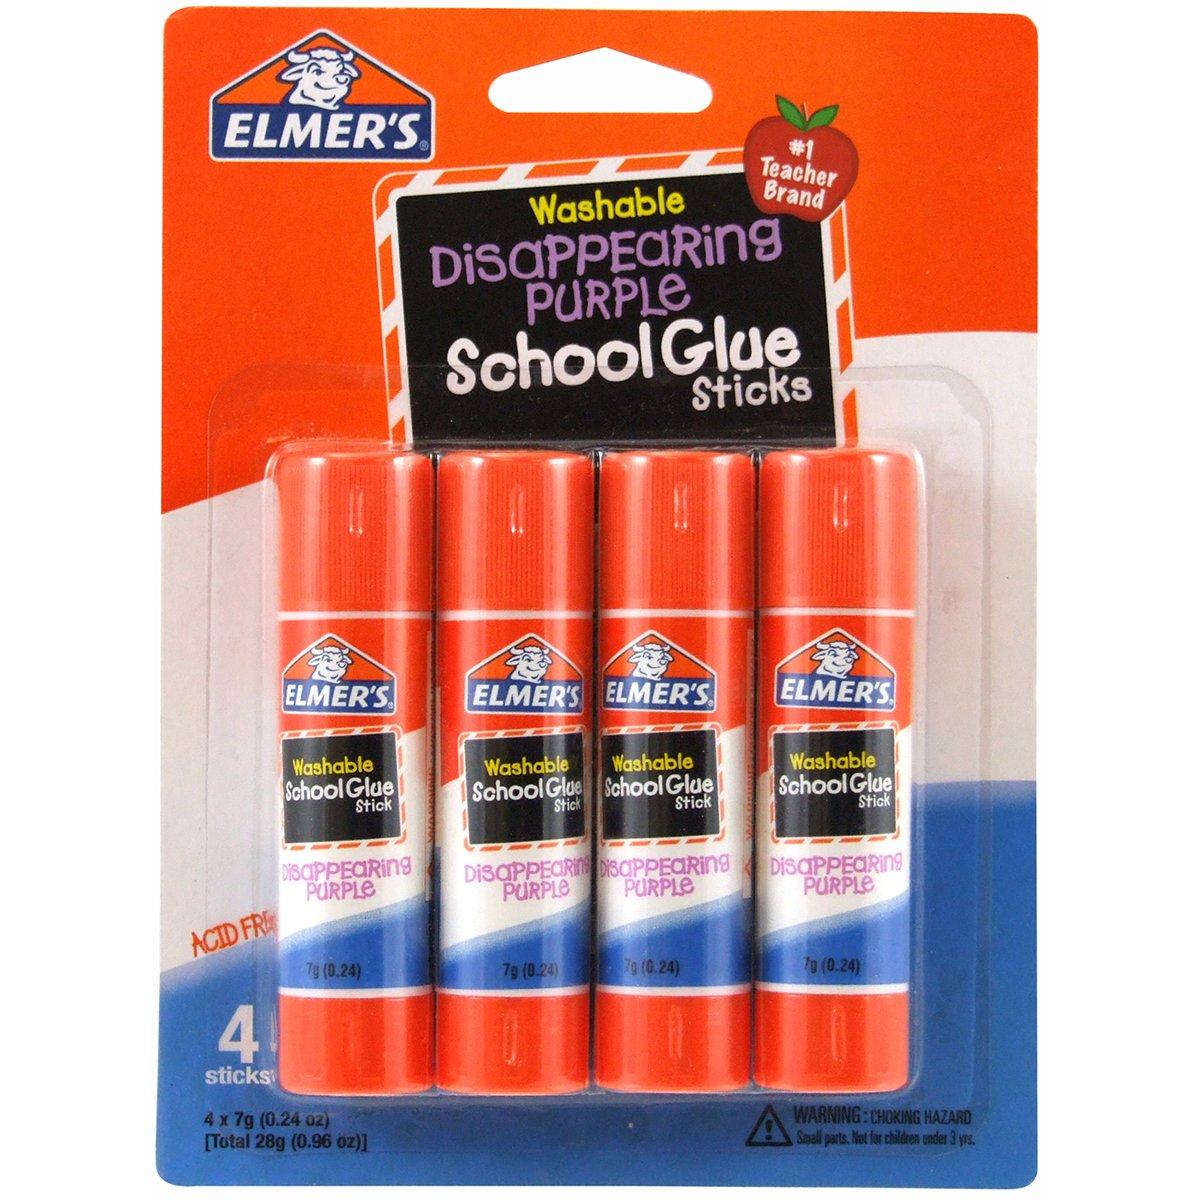 Elmer's Disappearing Purple School Glue Sticks, 0.24 oz Each, 4 Sticks per Pack (E543) Elmers